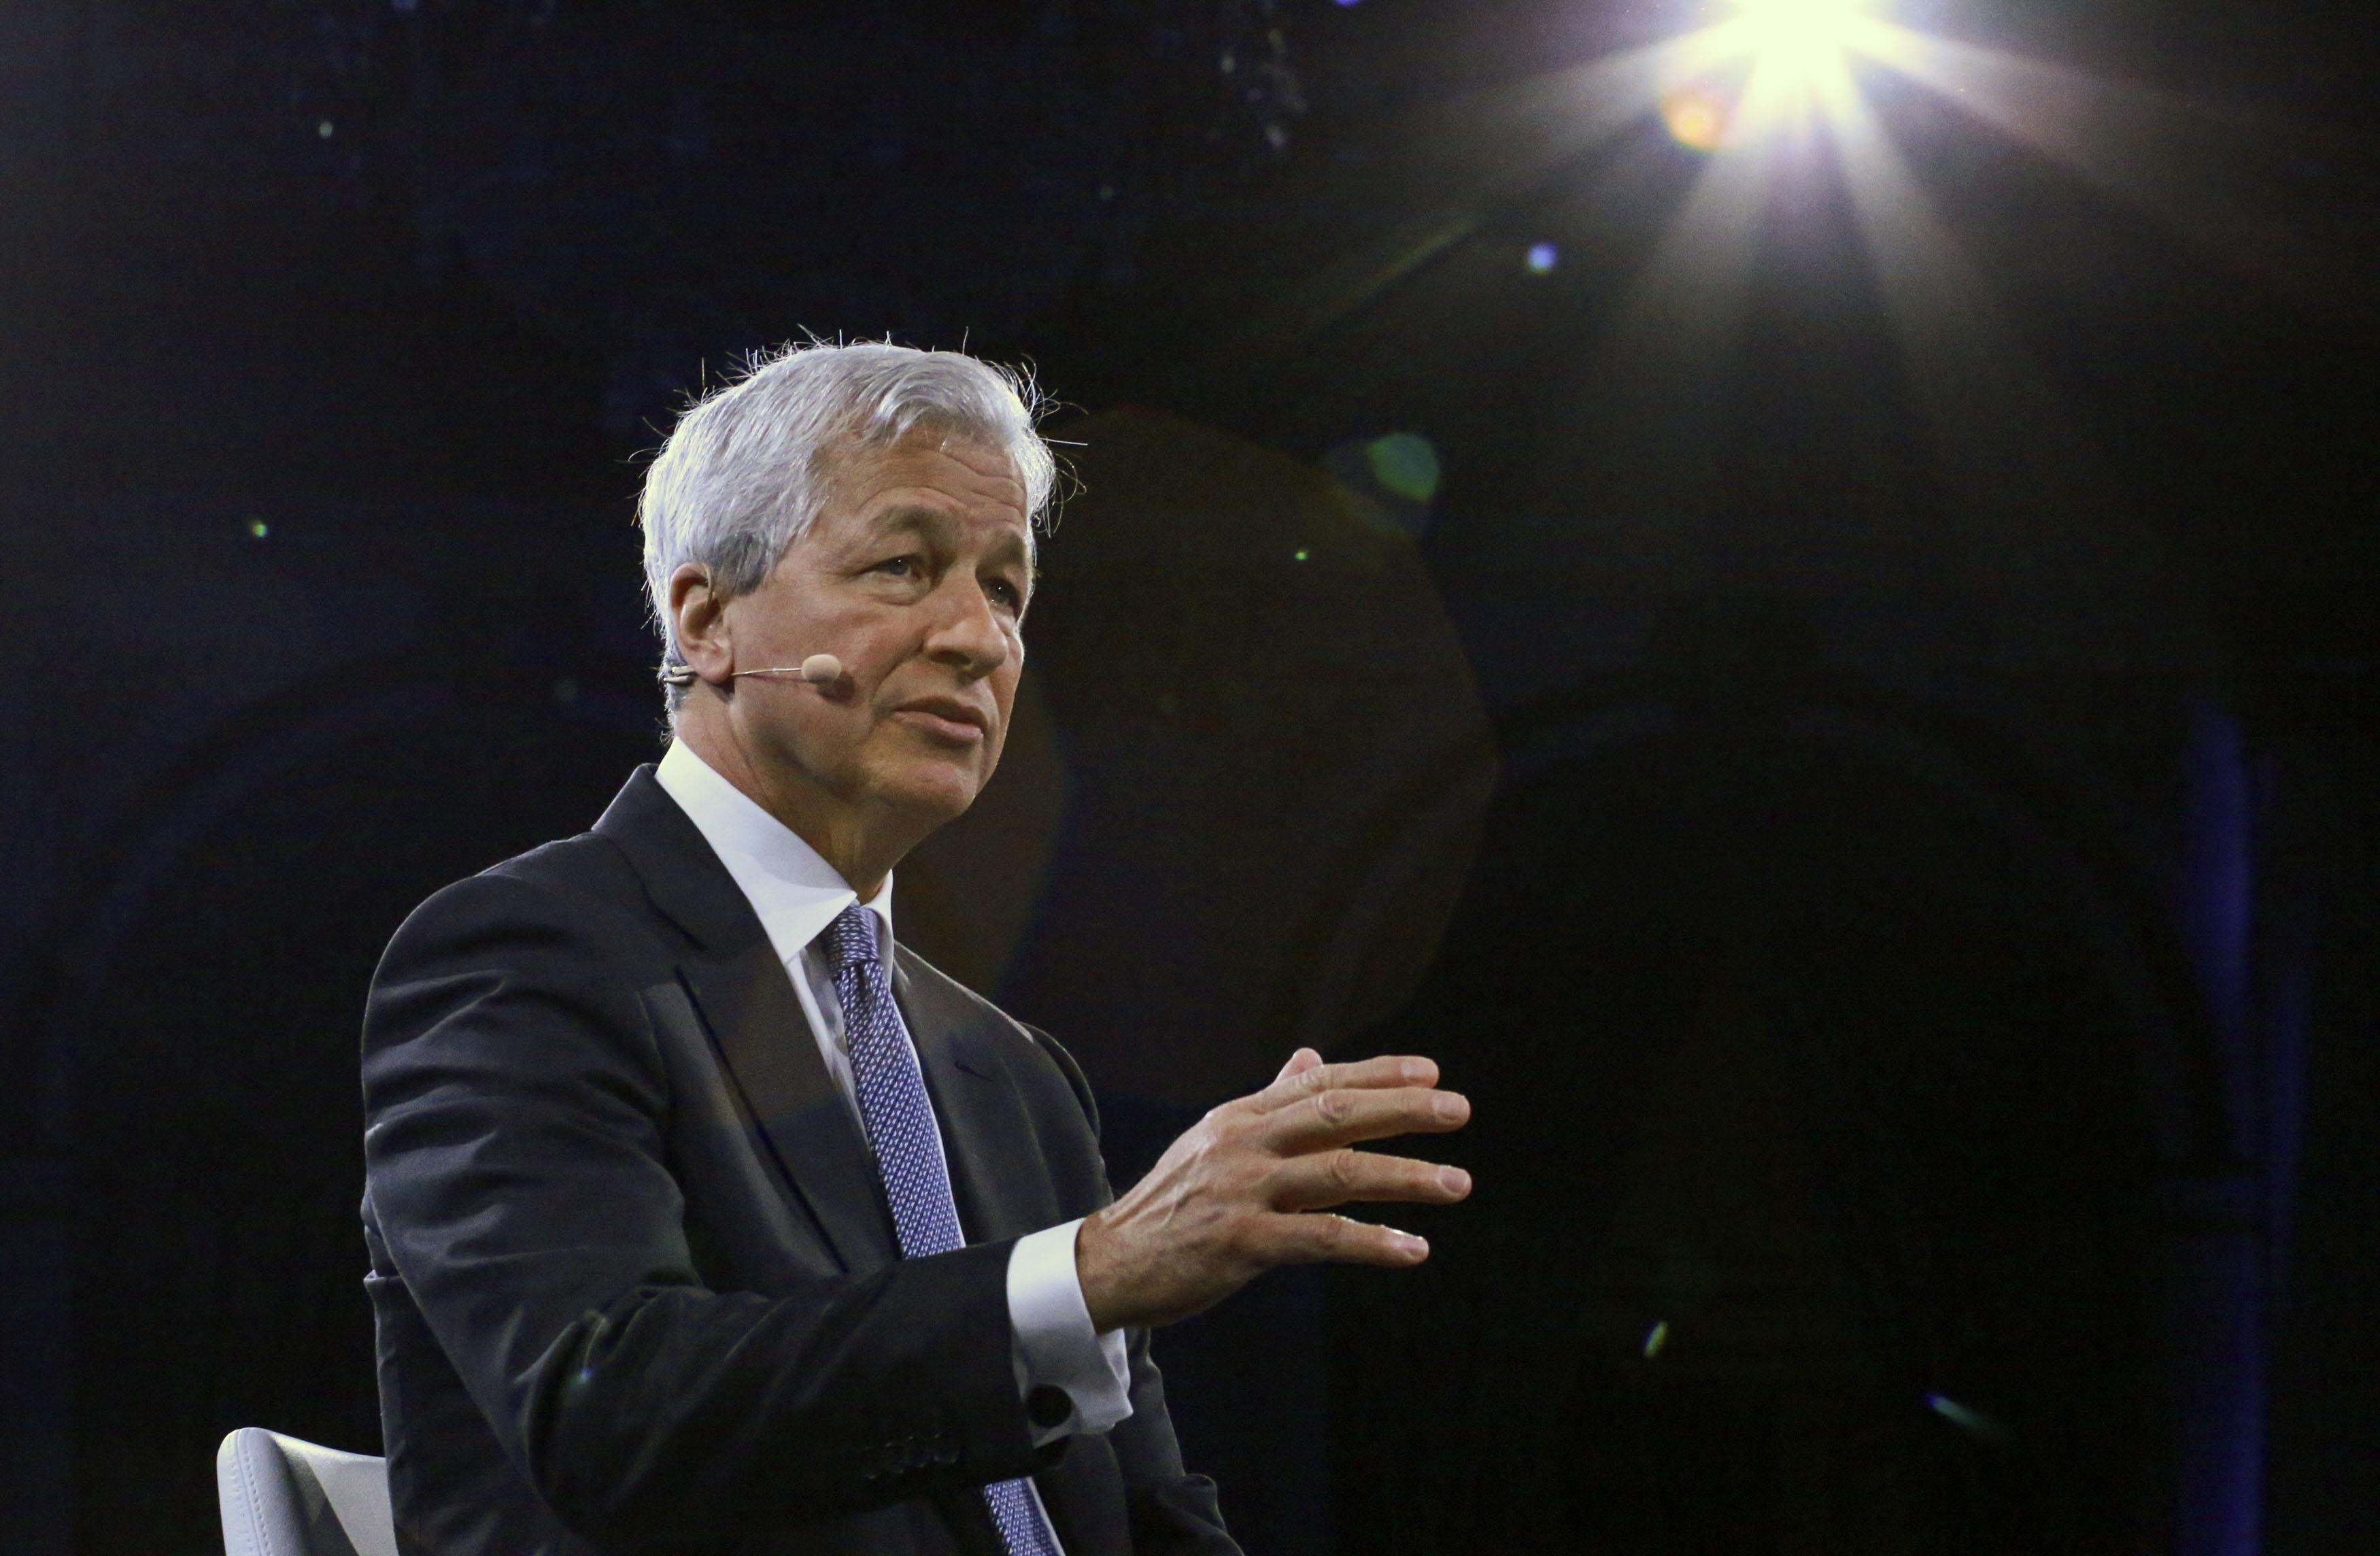 Jamie Dimon had a dream that coronavirus killed Davos attendees